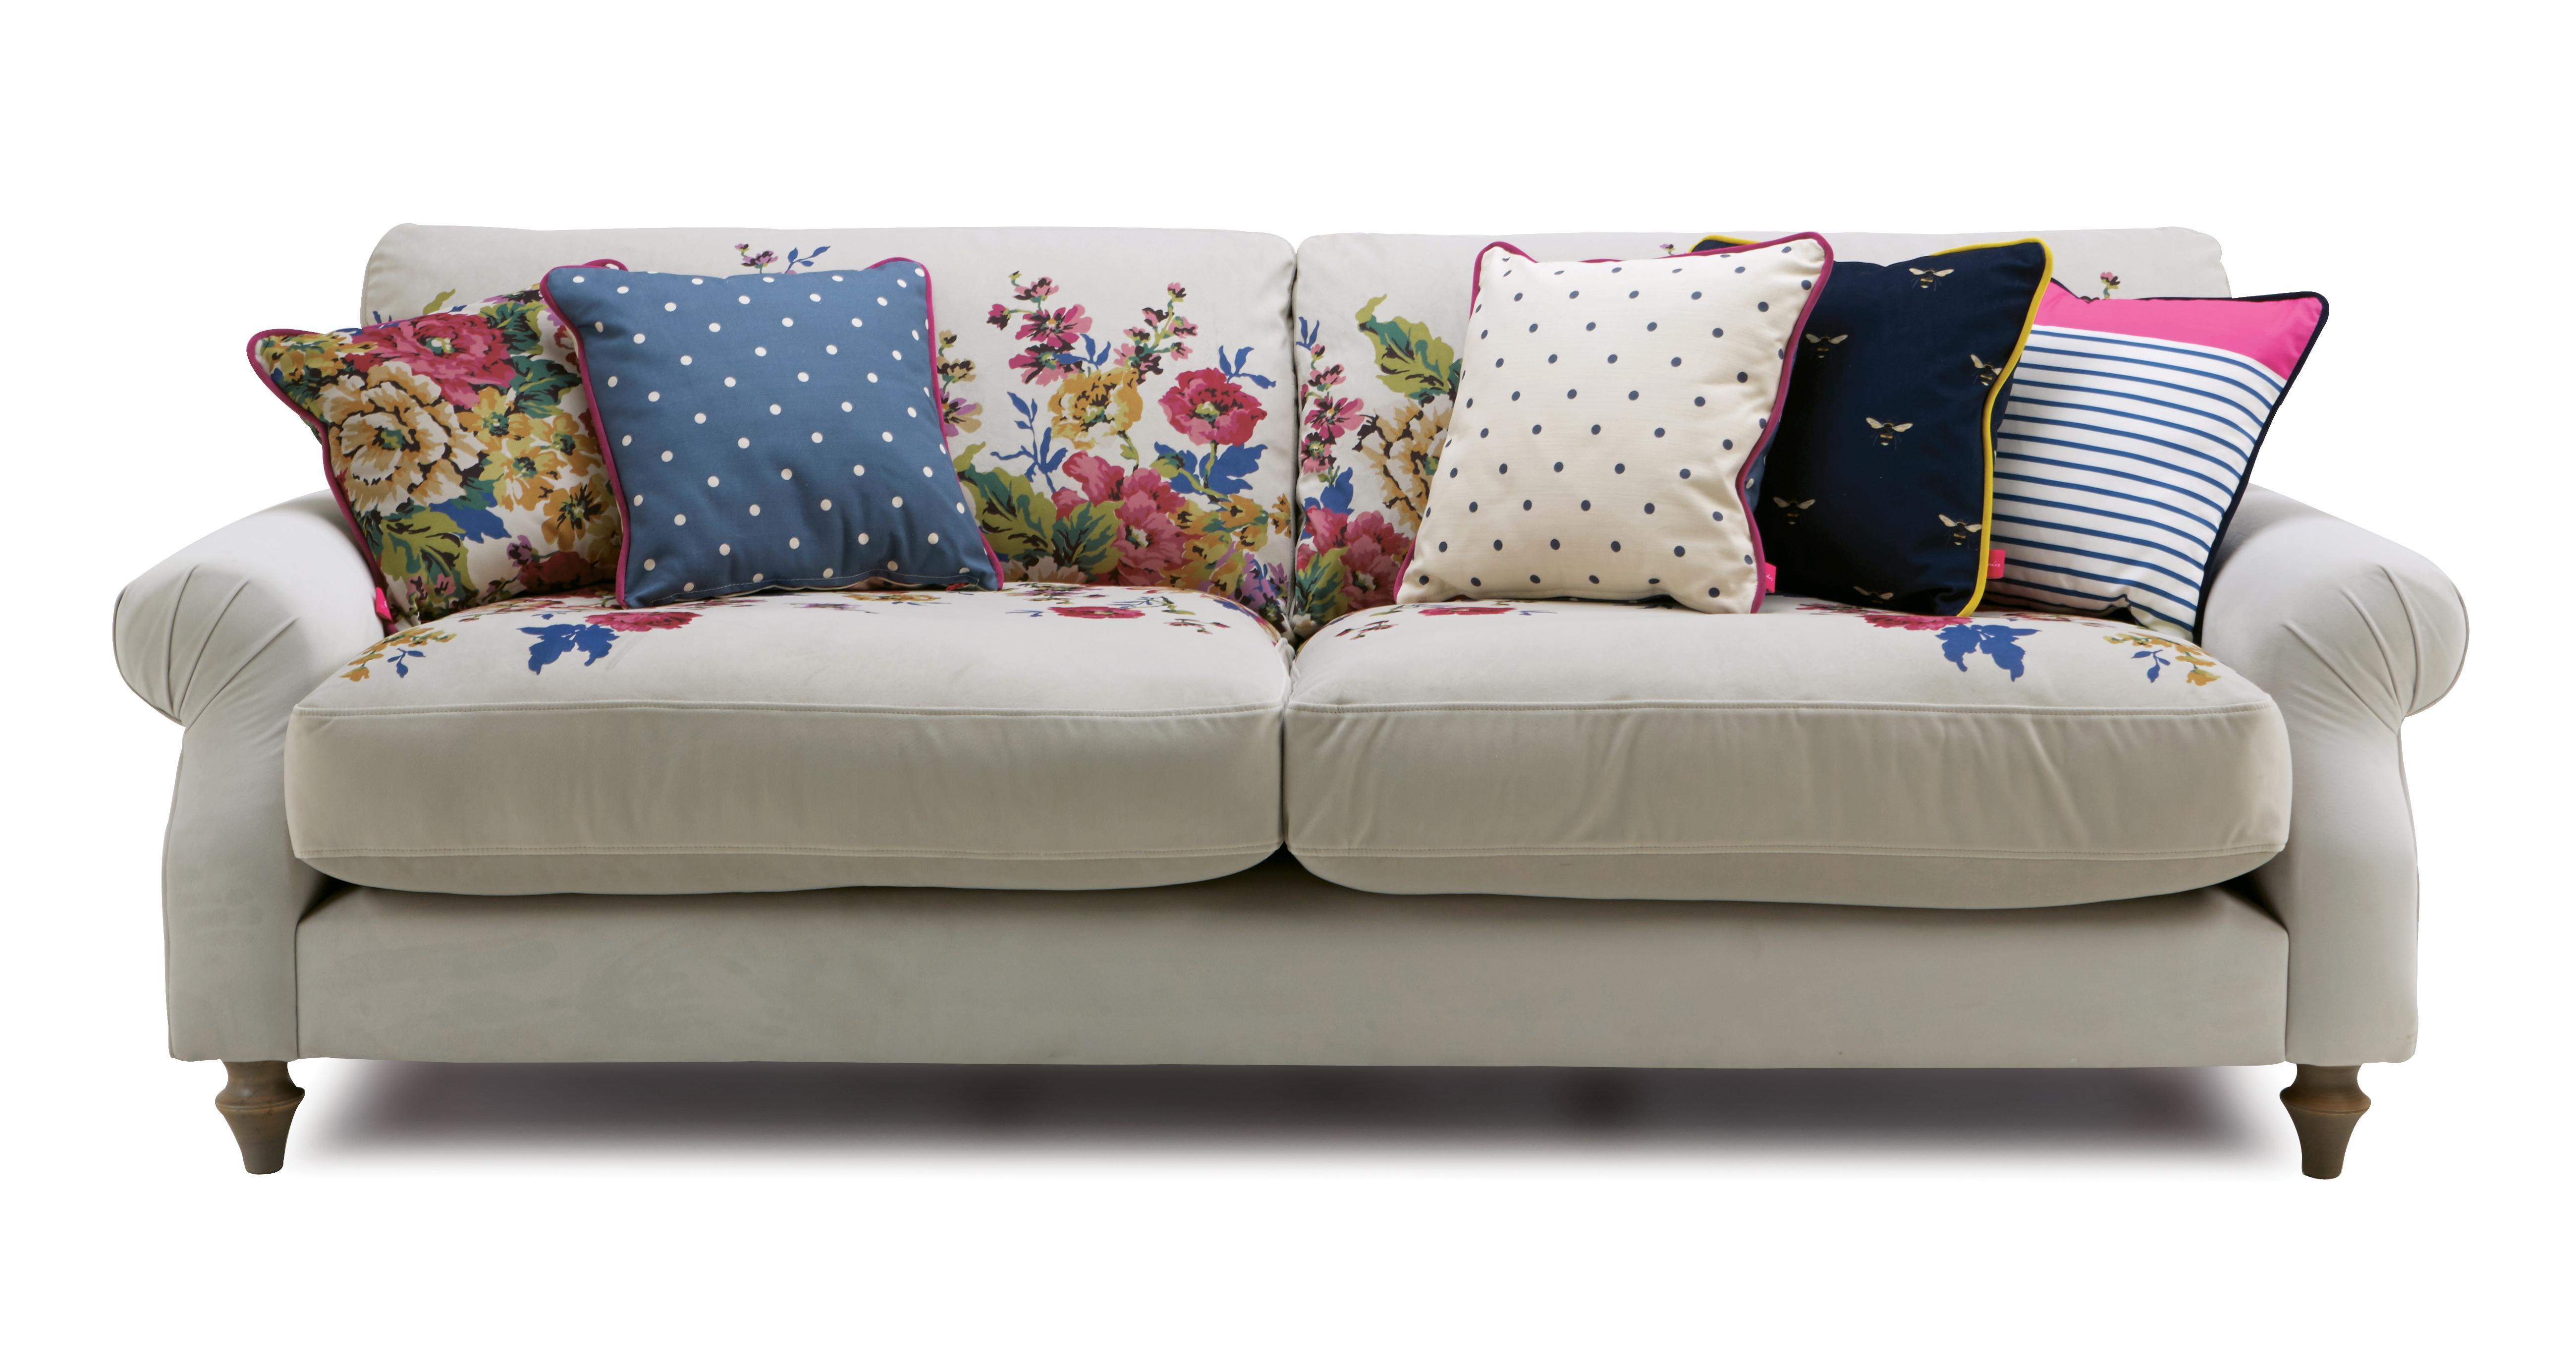 Cambridge Velvet 4 Seater Sofa Cambridge Plain And Floral Velvet Dfs